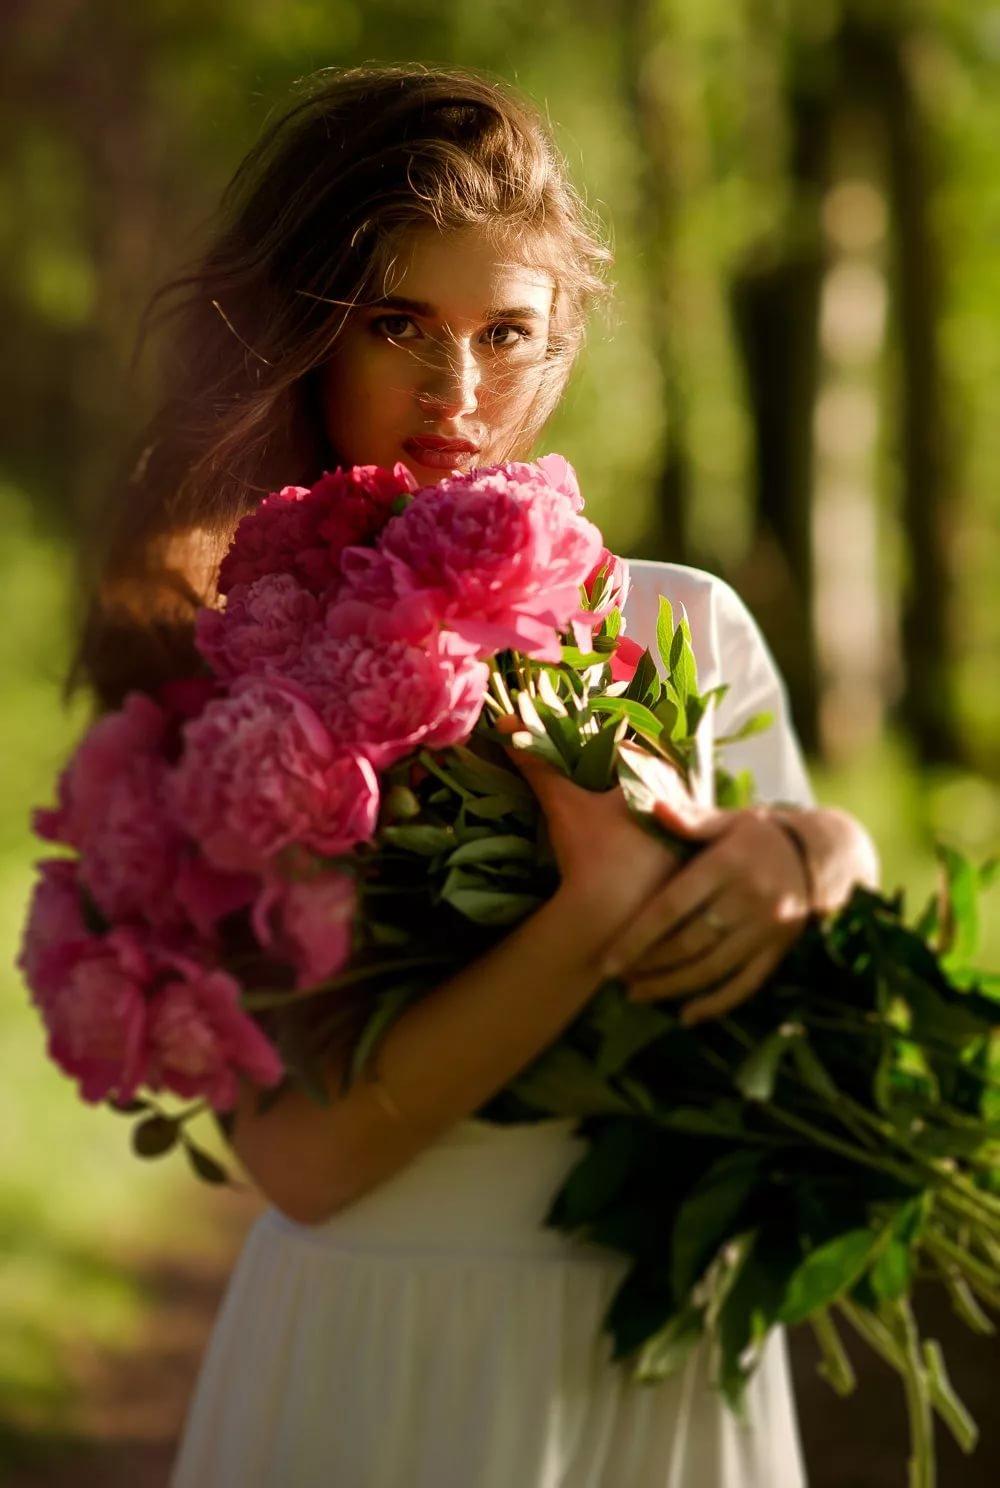 Картинки девушка с цветком в руке